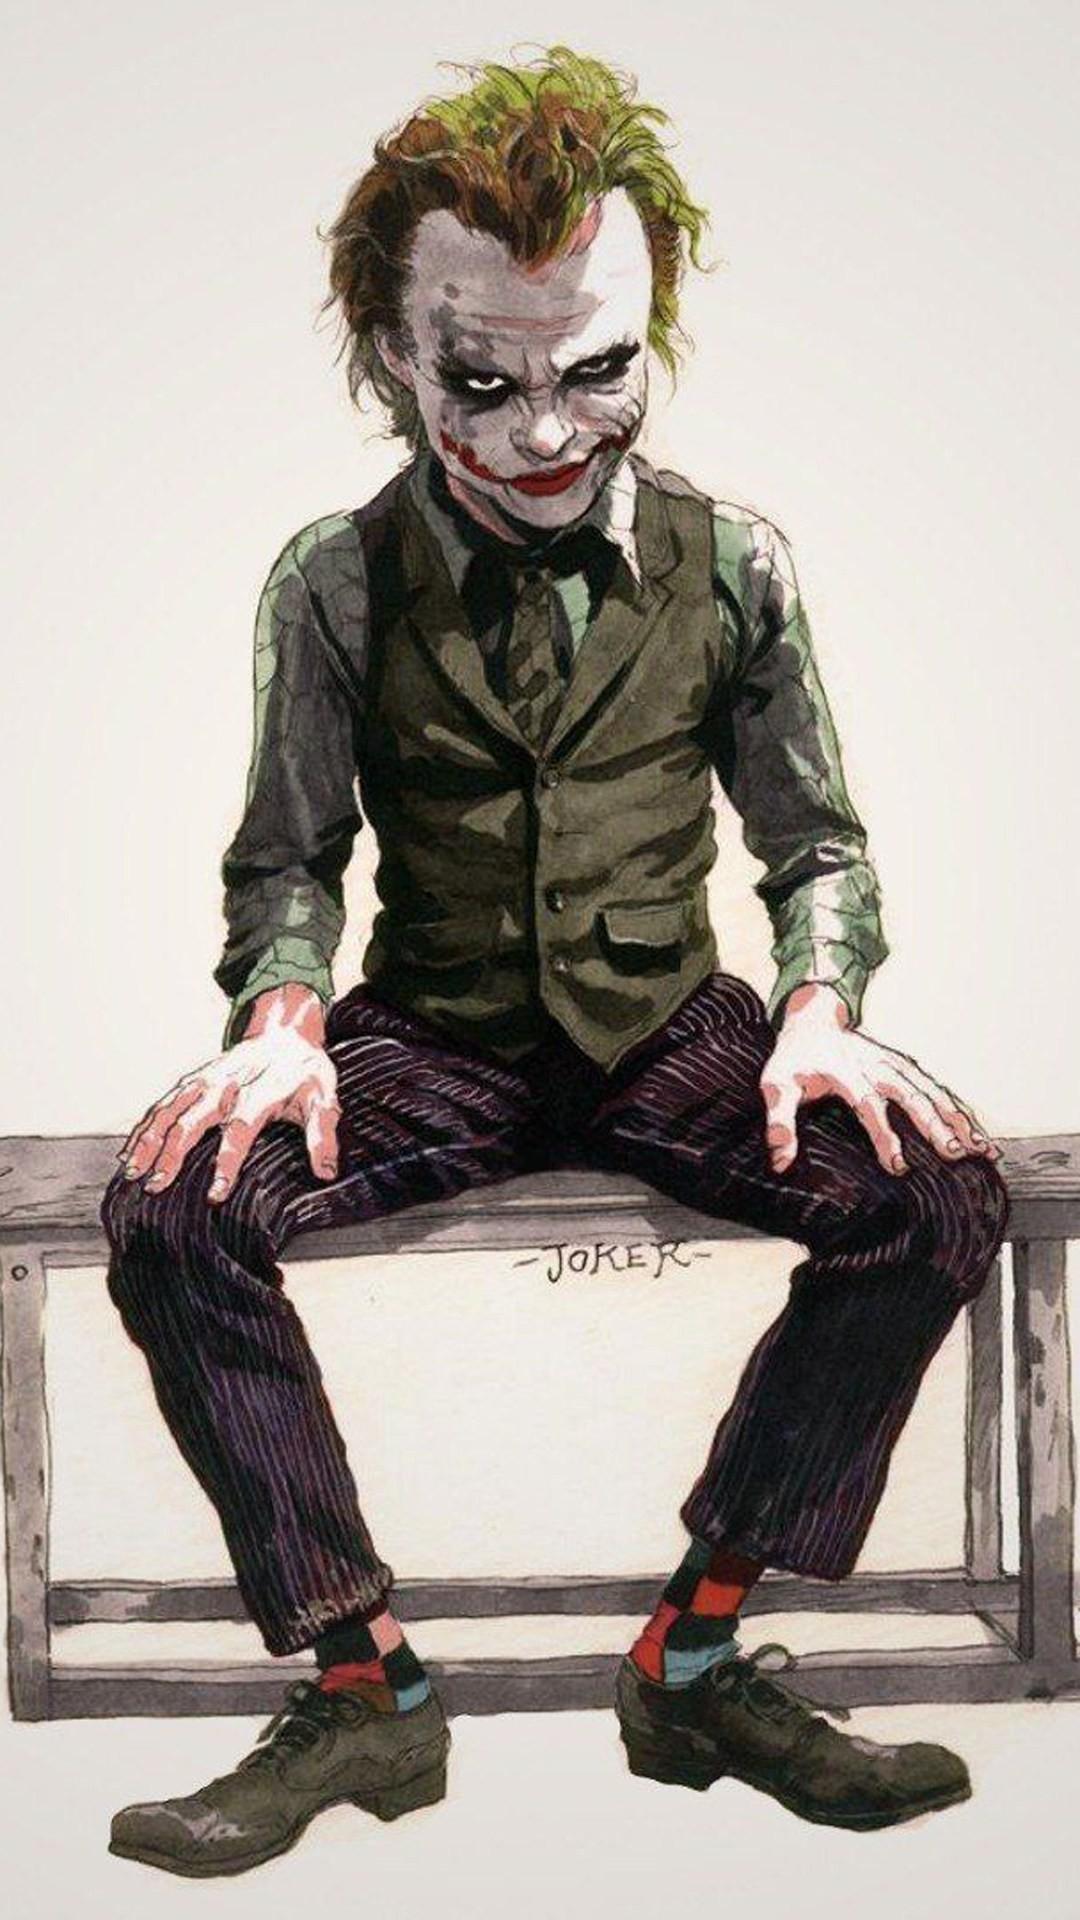 Joker Wallpapers For Iphone 7 Plus 6